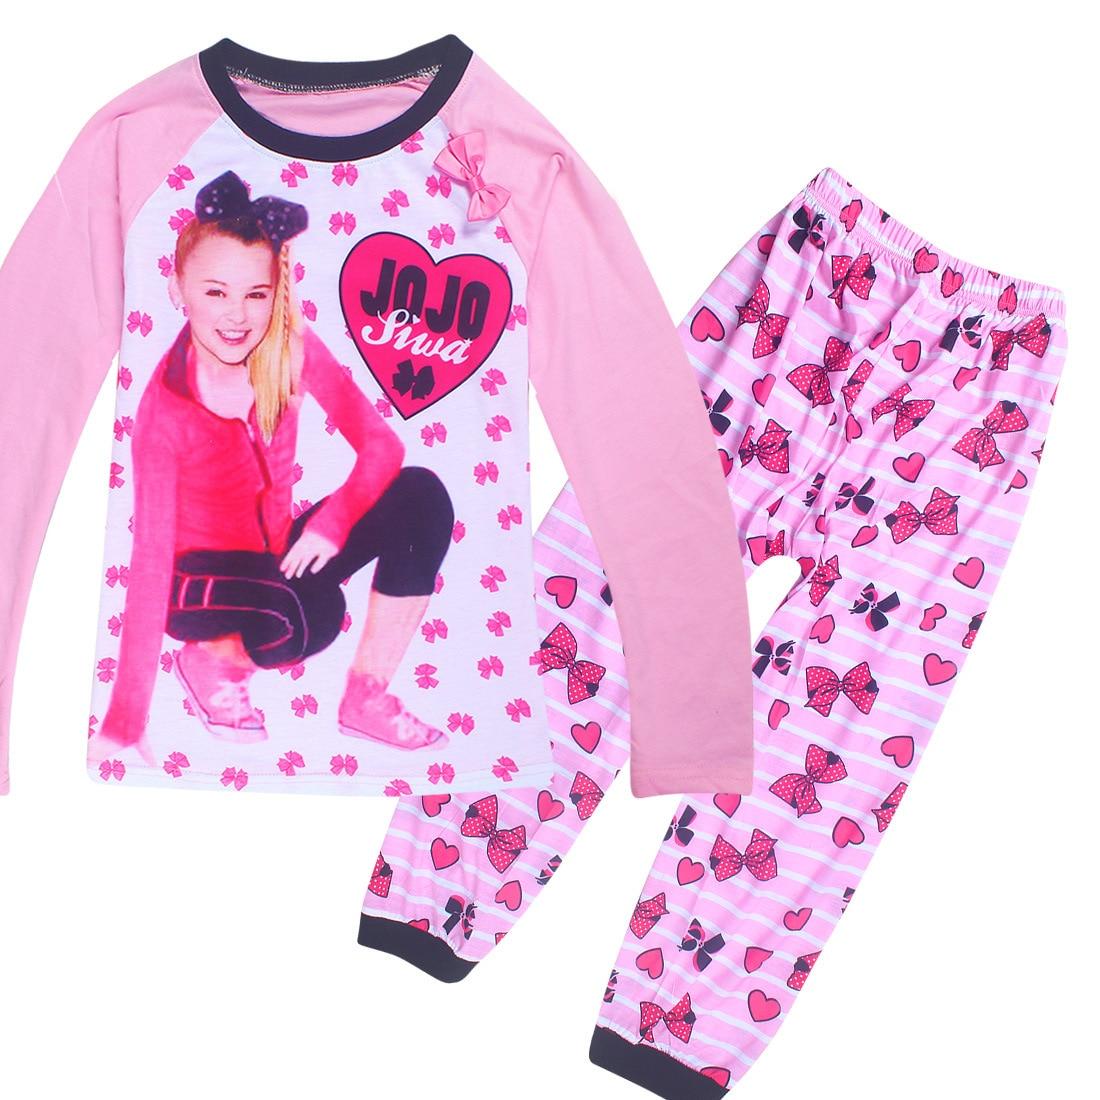 4-12 Years Jojo Siwa New Spring Autumn Children Pajamas For Baby Girls Teen Clothing Set Nightgown Cartoon Pyjamas Kids Clothes